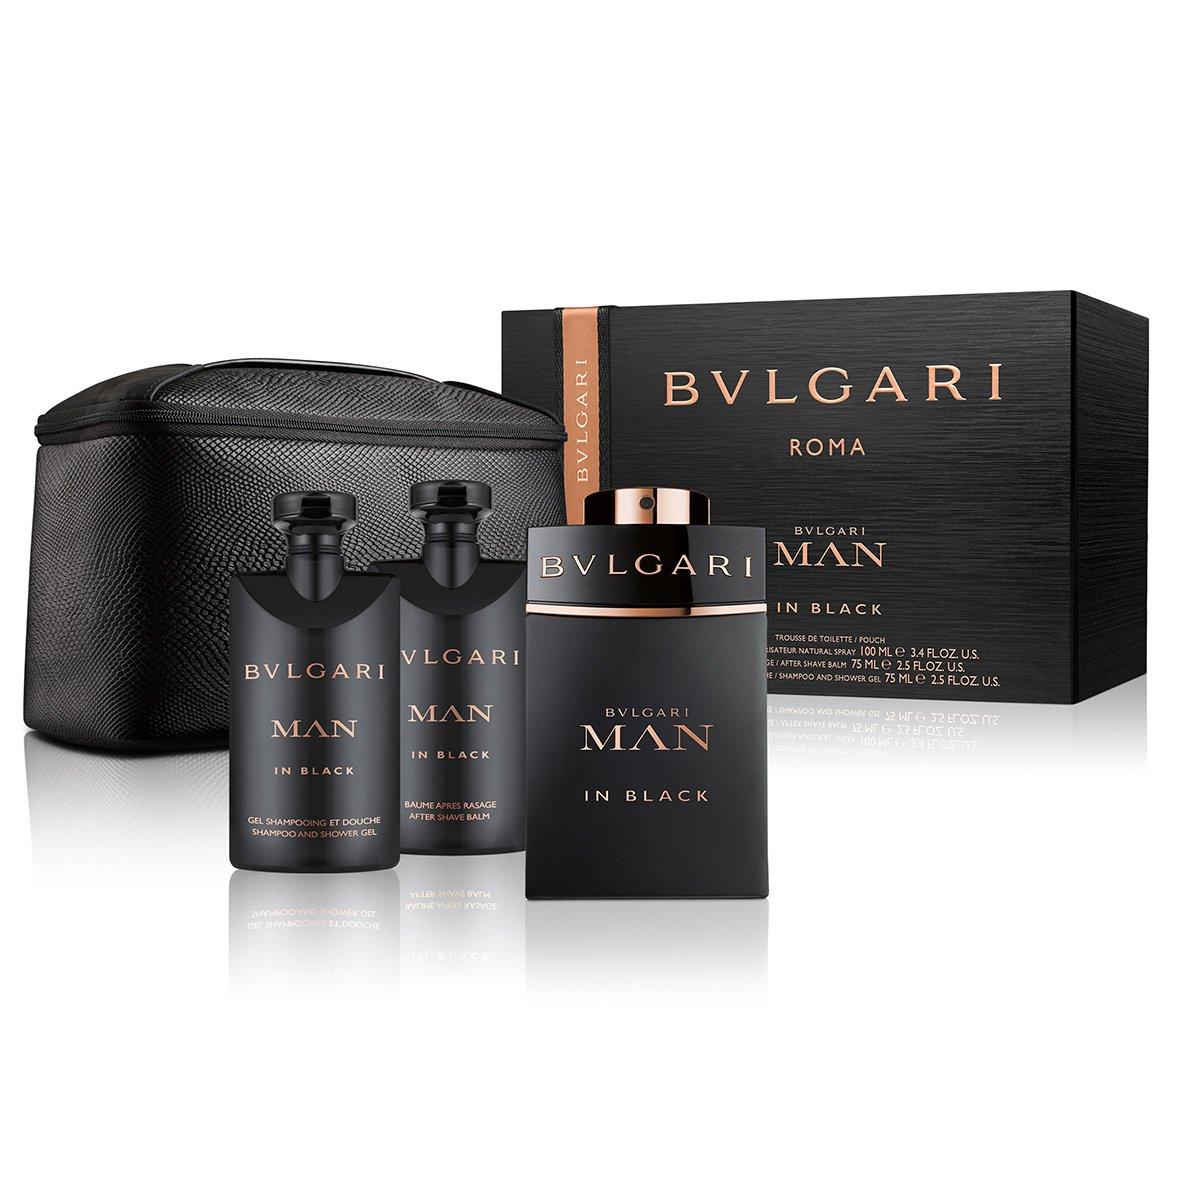 5961ac0c417 Bvlgari Kit Perfume Masculino Man In Black 100ml + Gel de Banho 75ml + Pós  Barba 75ml + Bolsa - Compre Agora